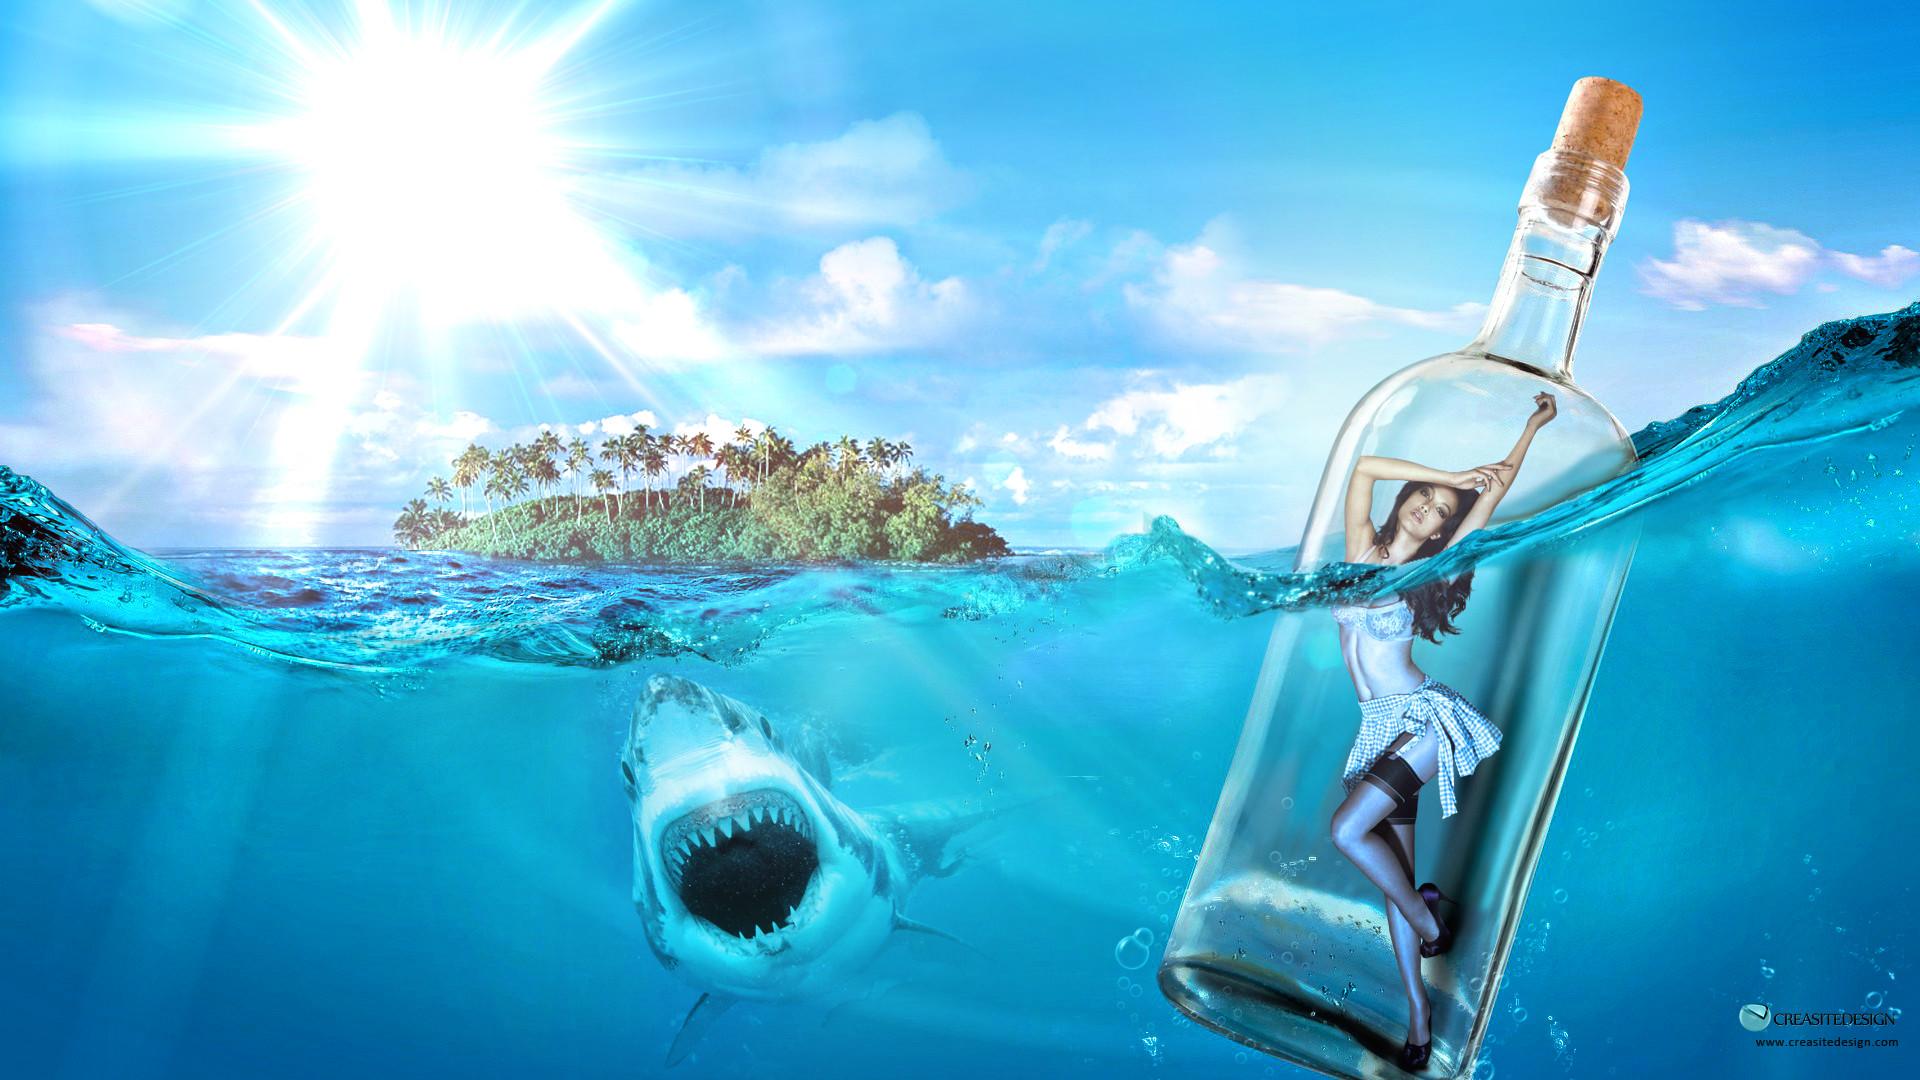 … Water-Bottle-girl-island-creasitedesign-wallpa by creasitedesign